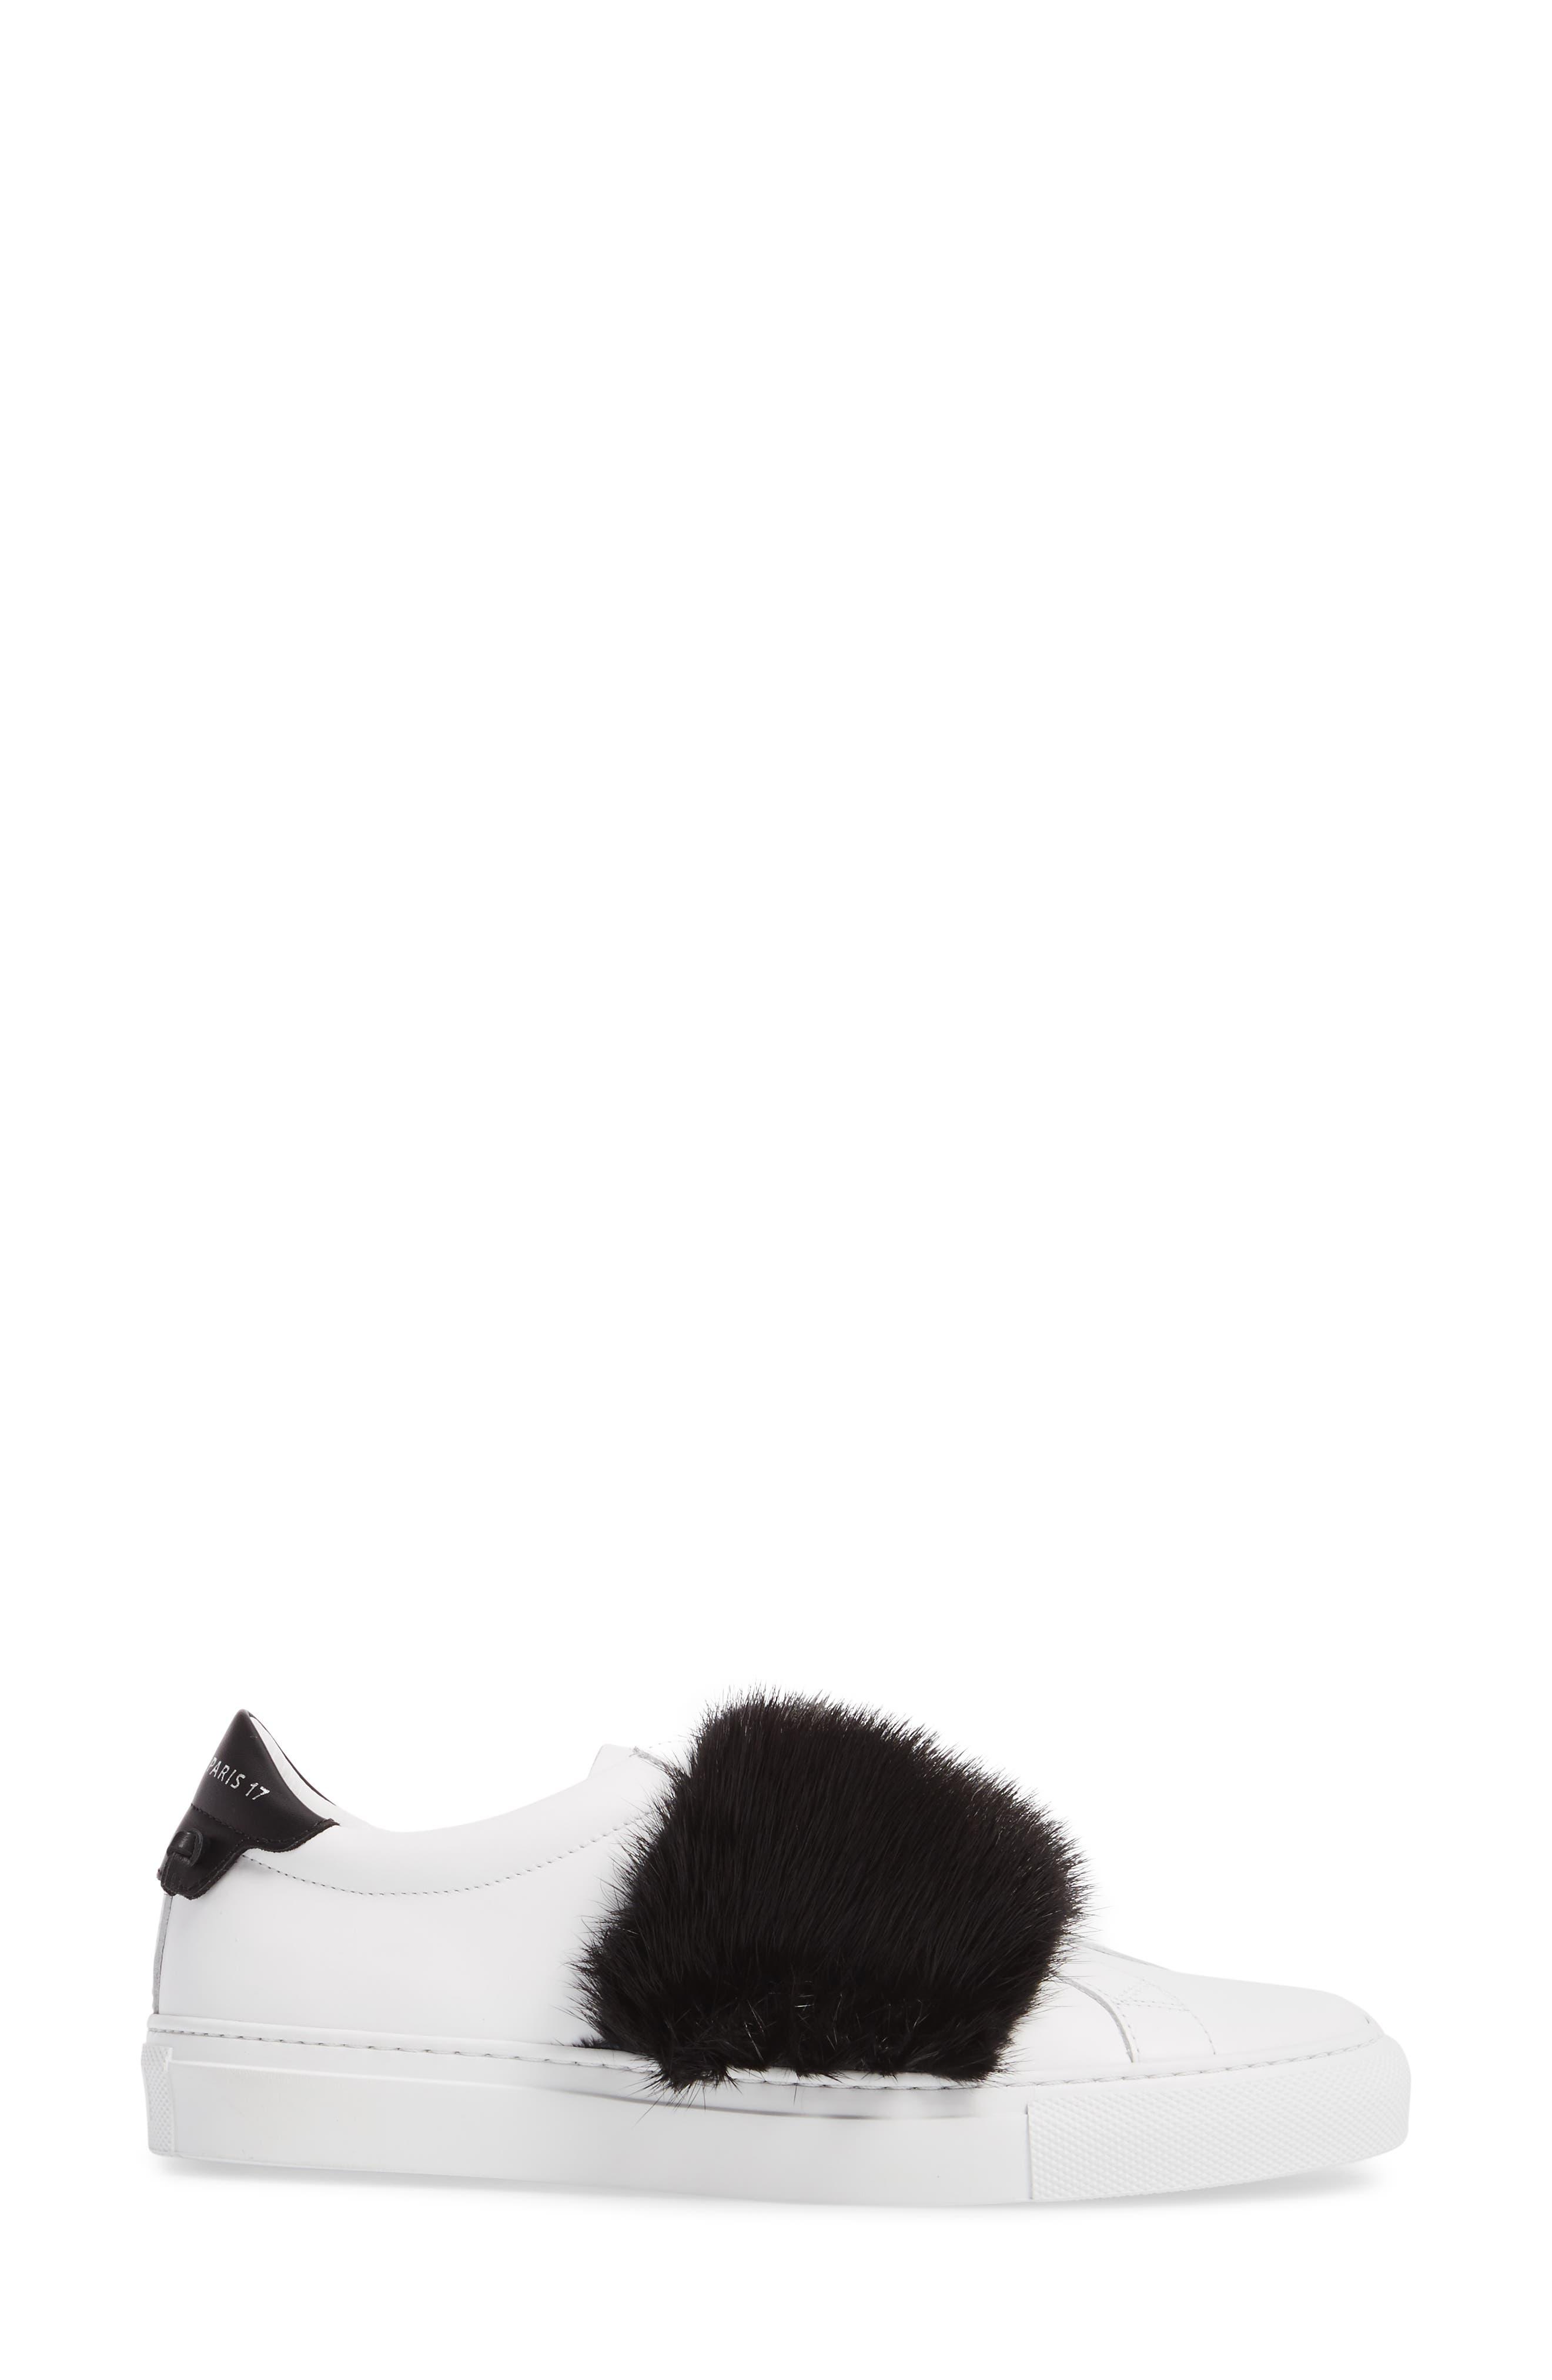 Alternate Image 3  - Givenchy Urban Street Slip-On Sneaker with Genuine Mink Fur Trim (Women)